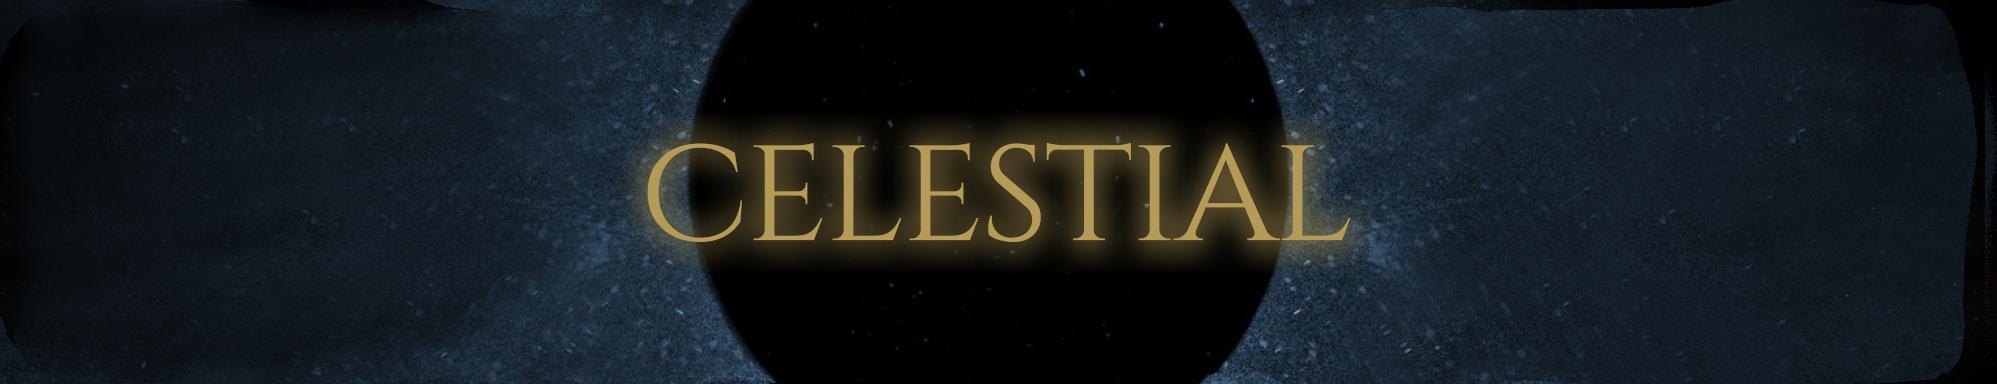 FRIDA. Celestial Banner.png